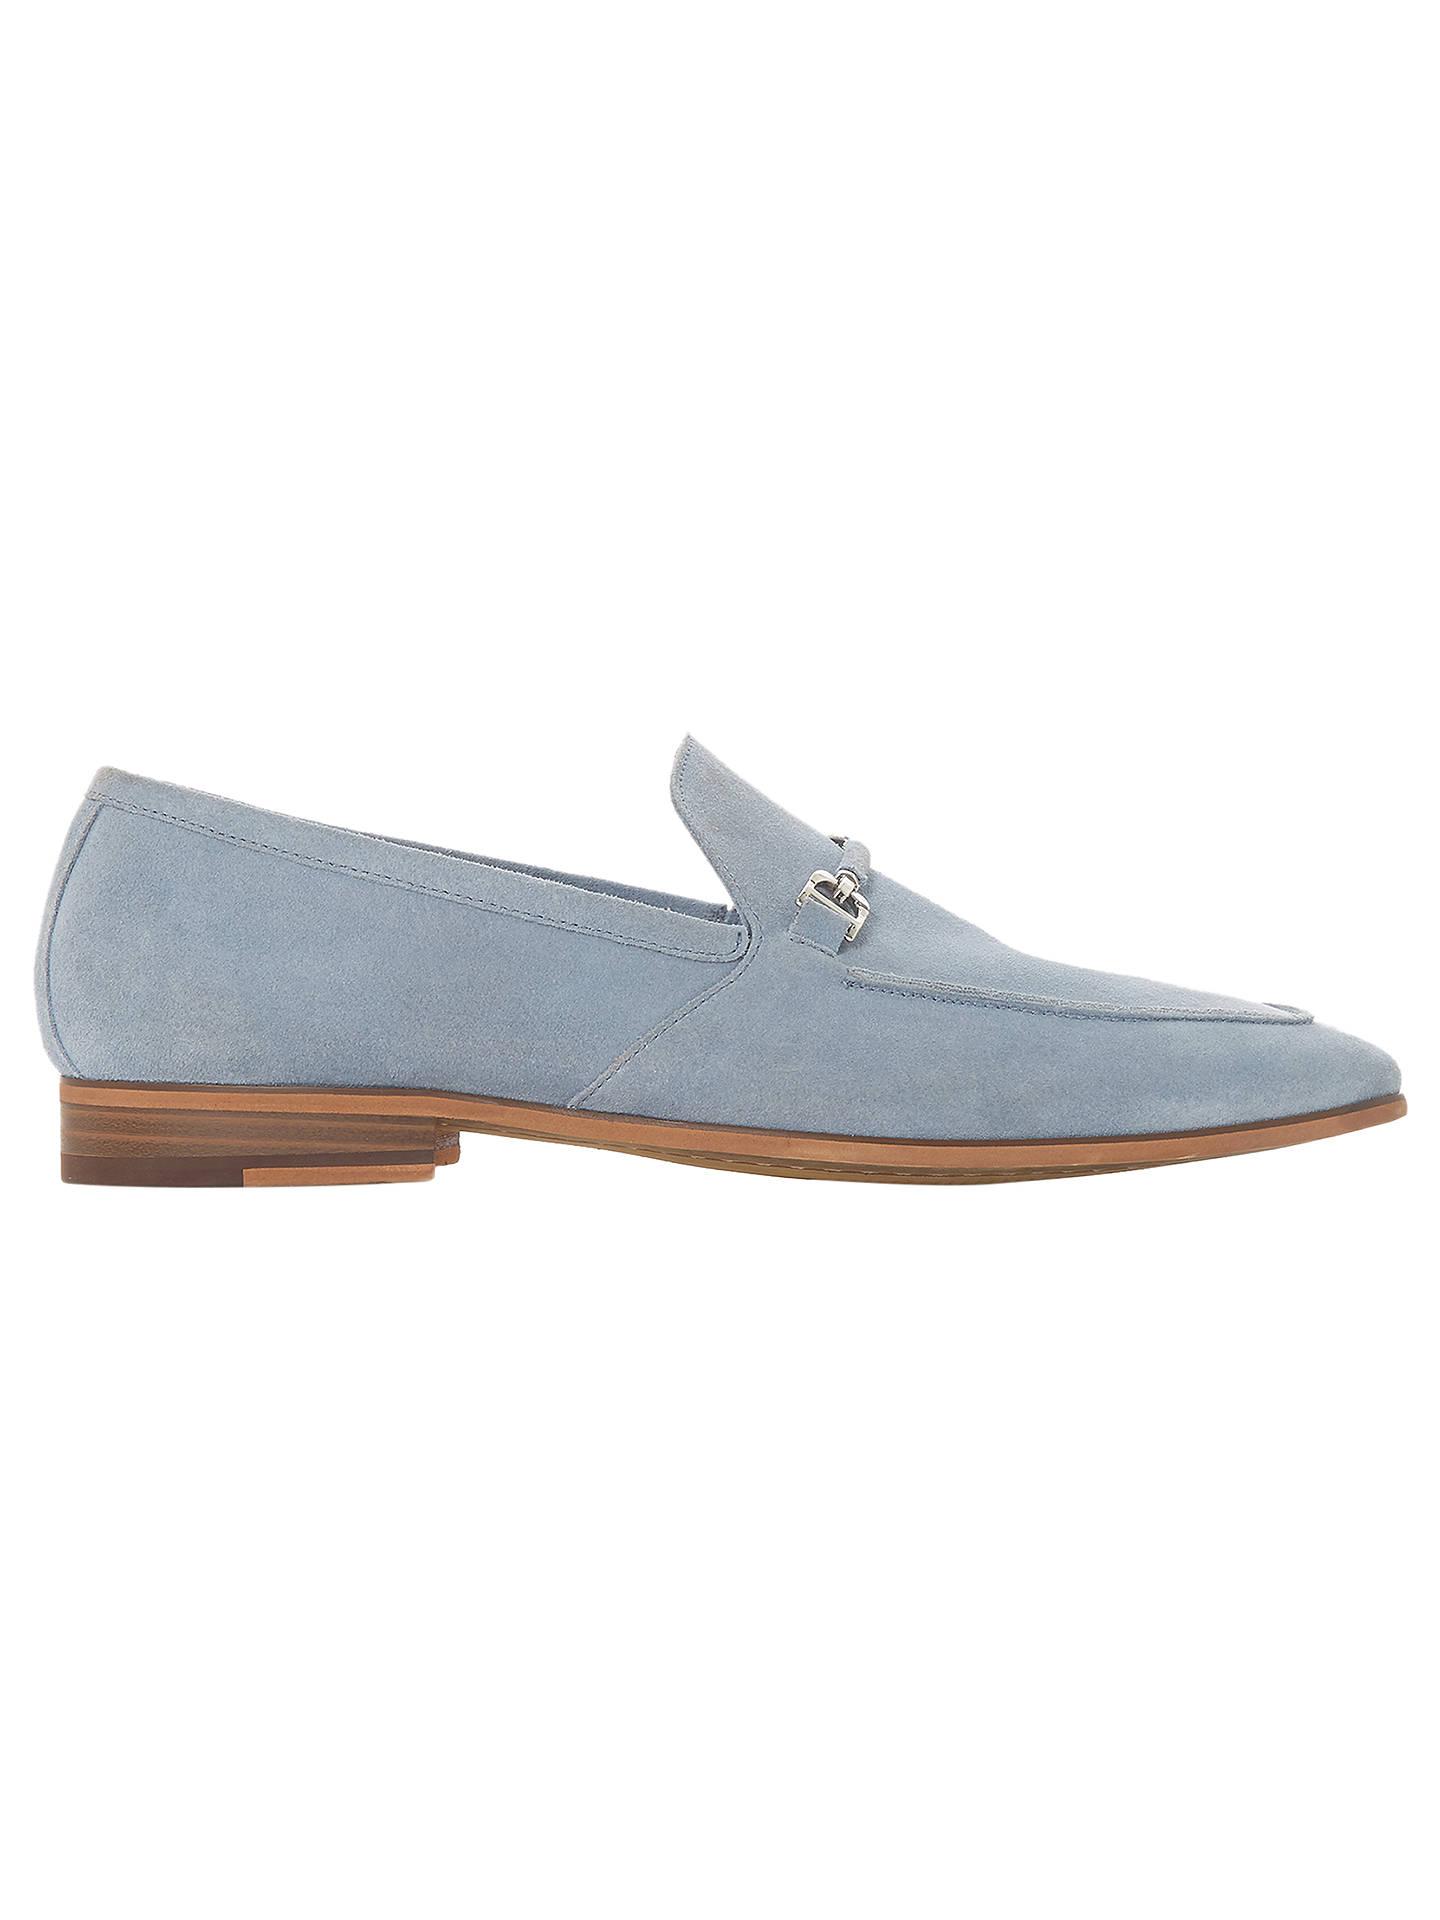 b17baaca6e97c Buy Dune Paulinho Suede Loafers, Light Blue, 8 Online at johnlewis.com ...